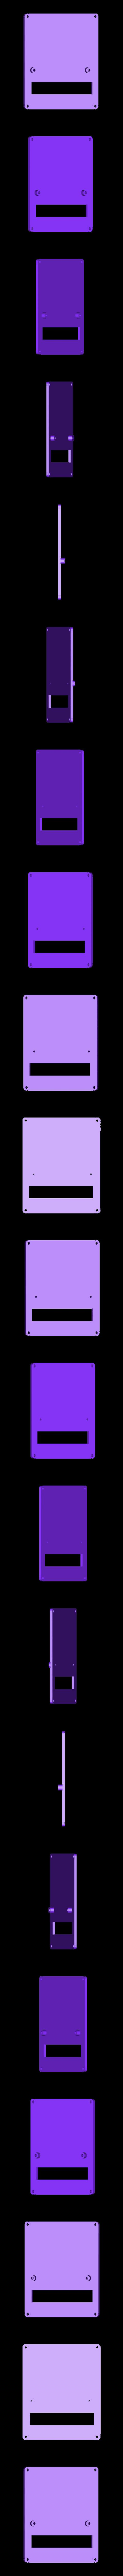 ingenious_borwo-amberis_4.stl Download free STL file warp core control panel • 3D print model, NohaBody